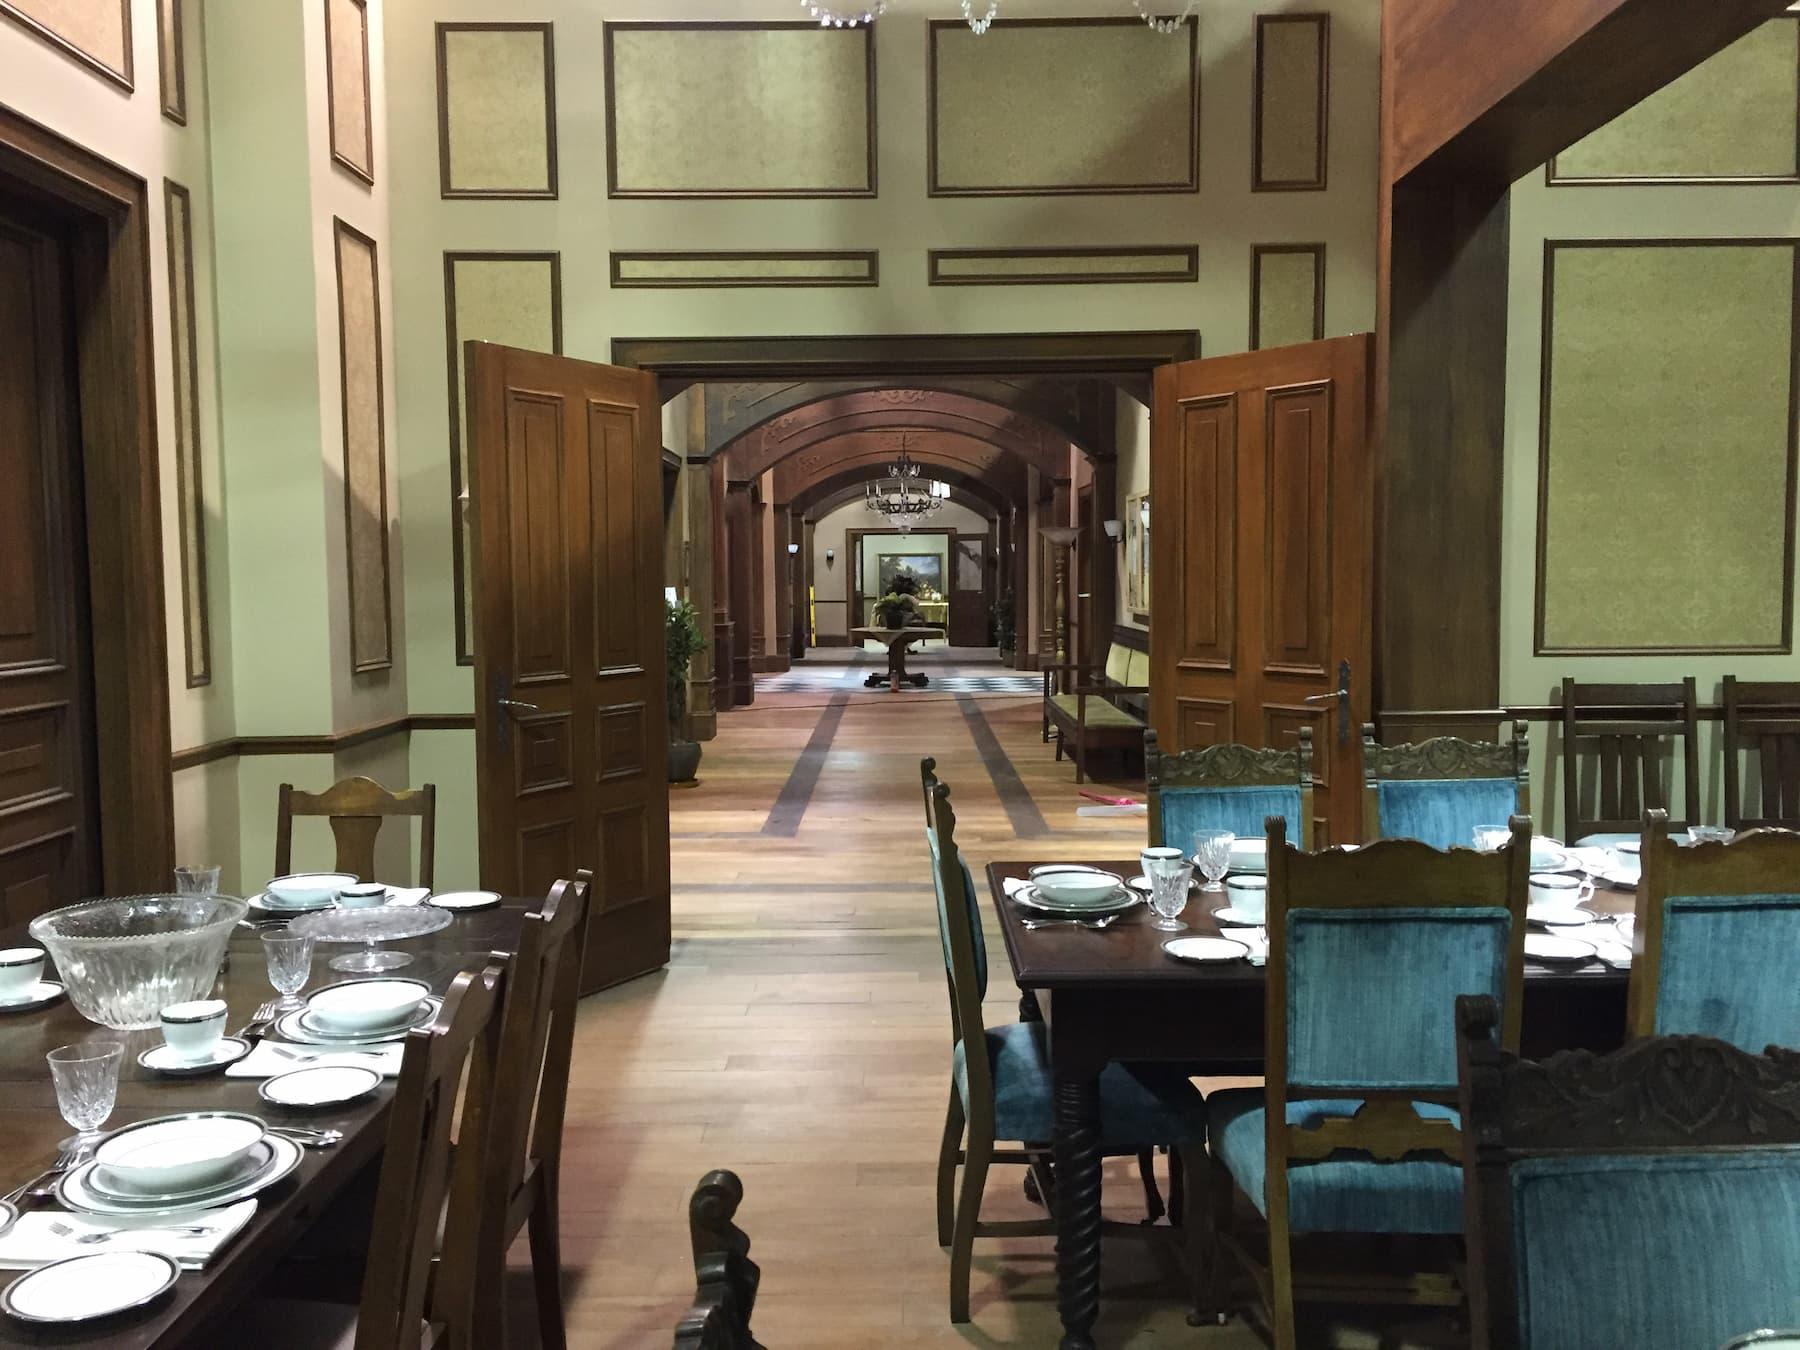 dinning hall in prep school